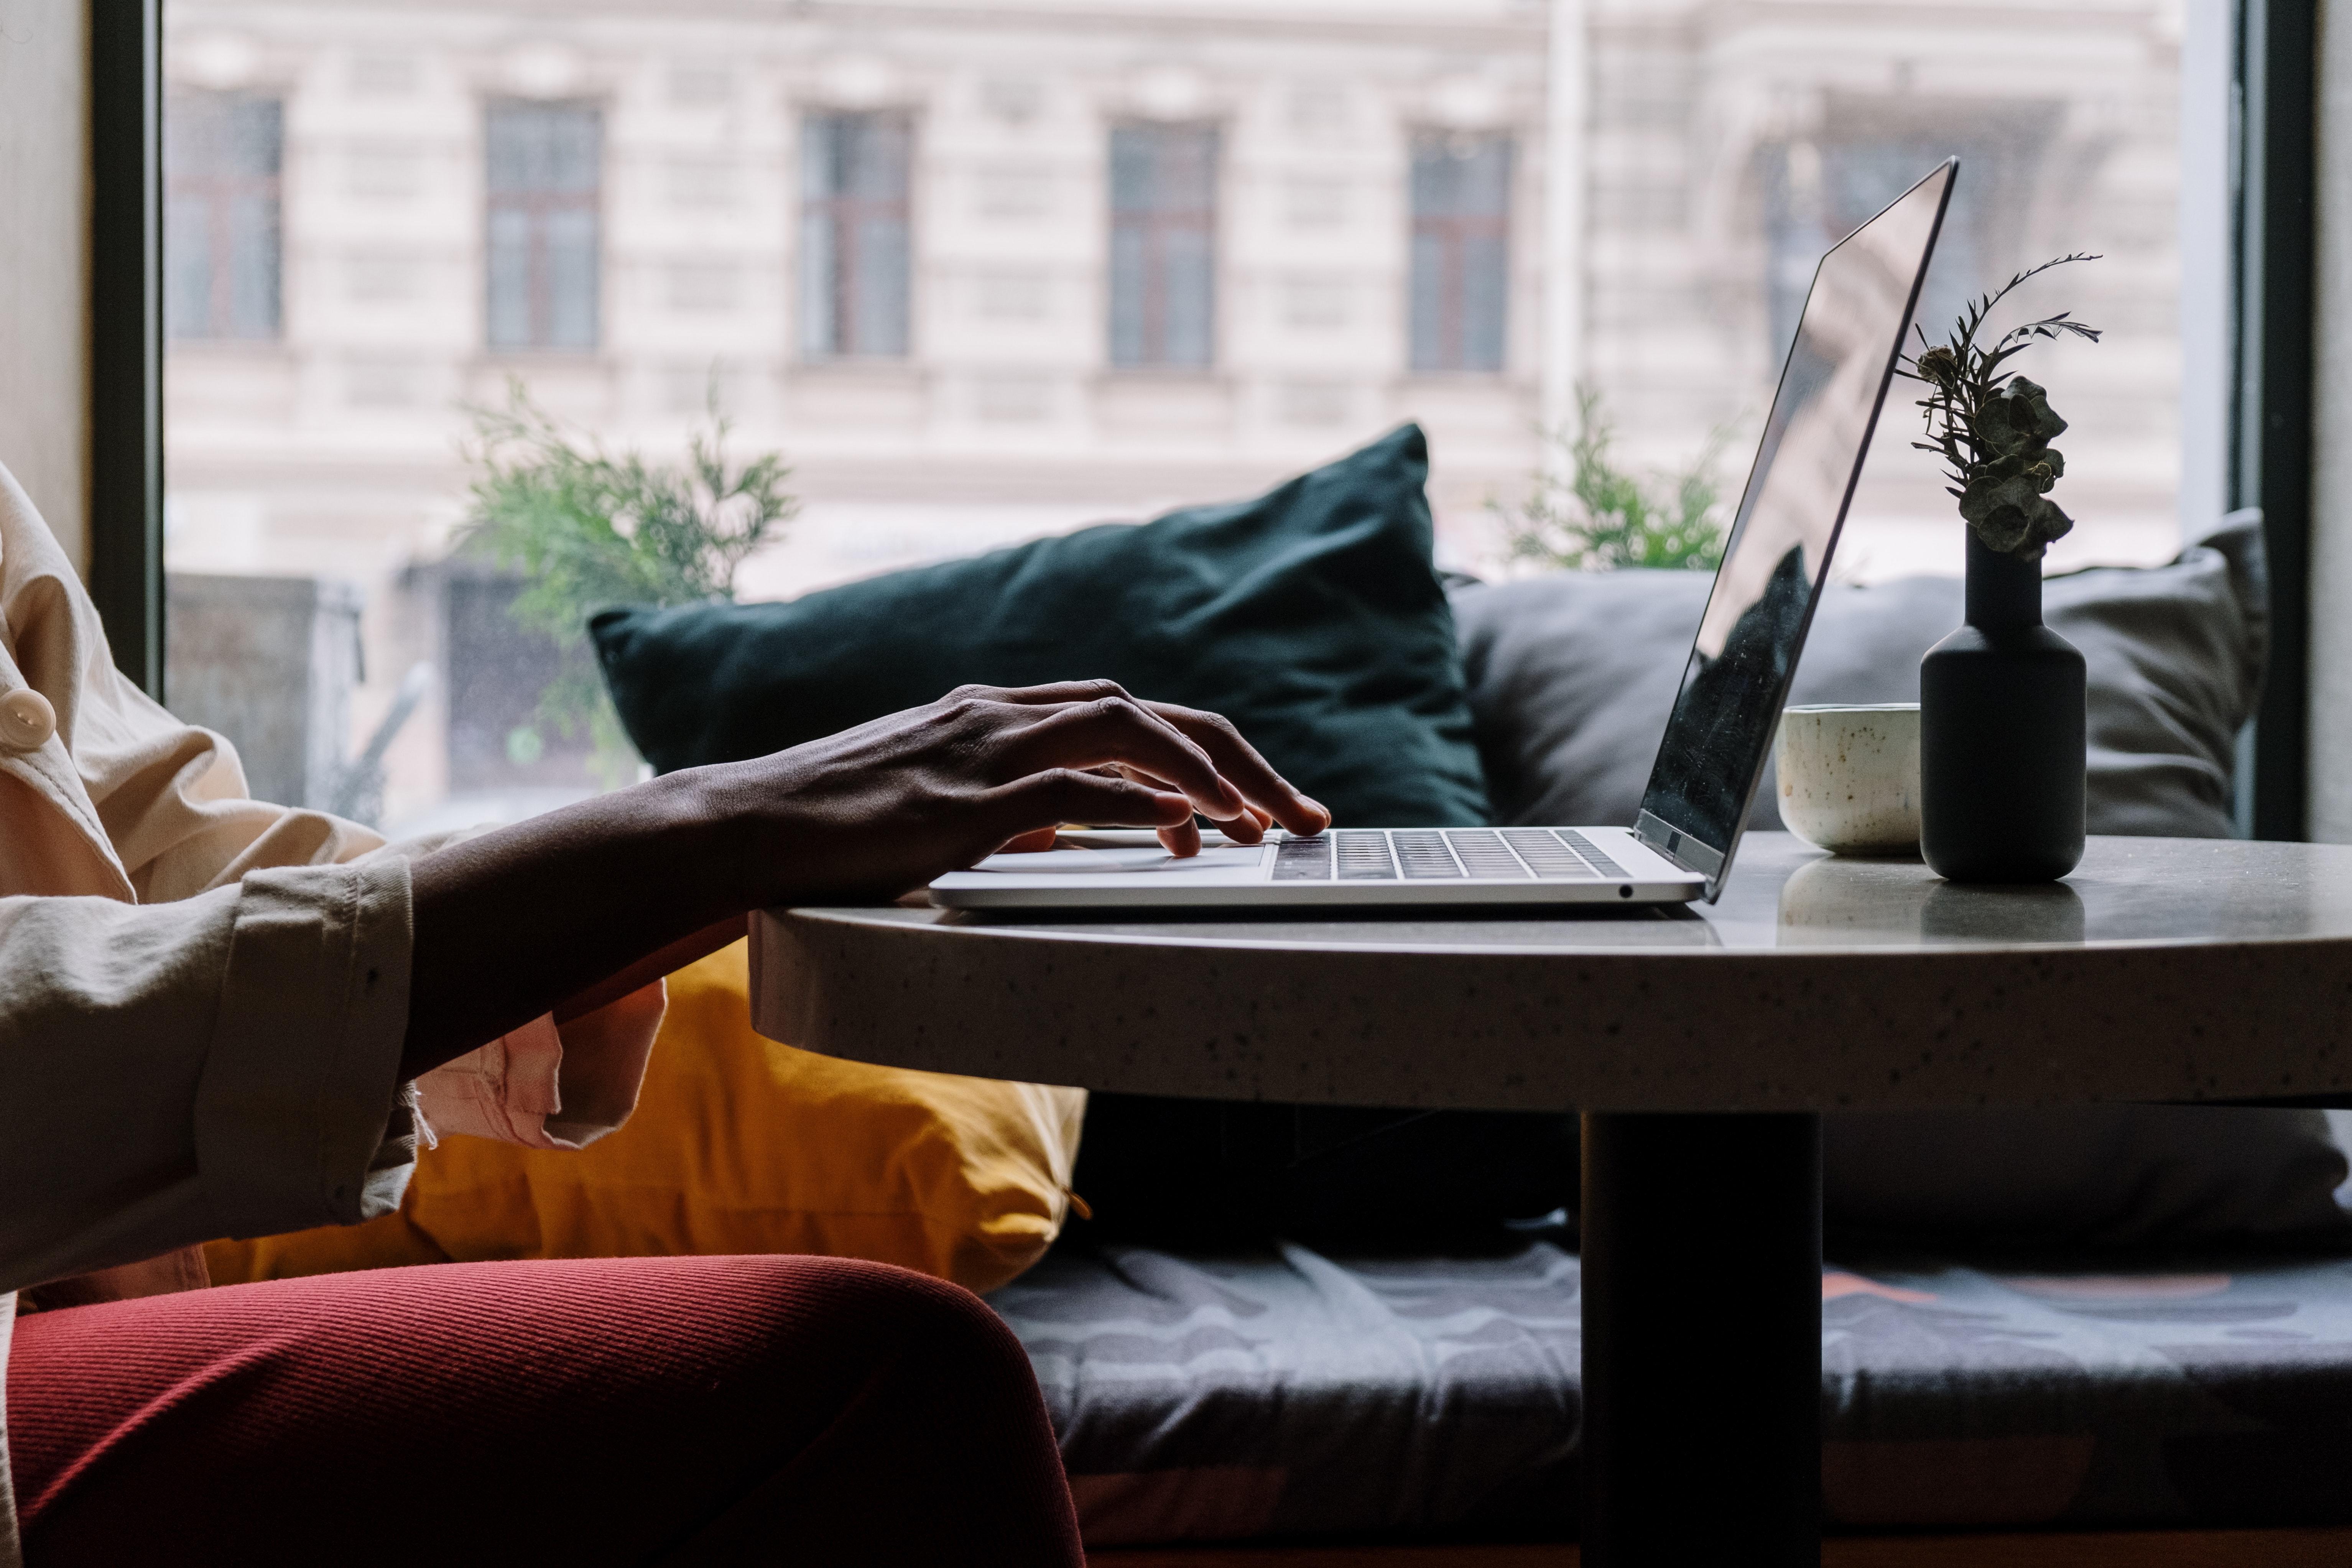 student studing on laptop